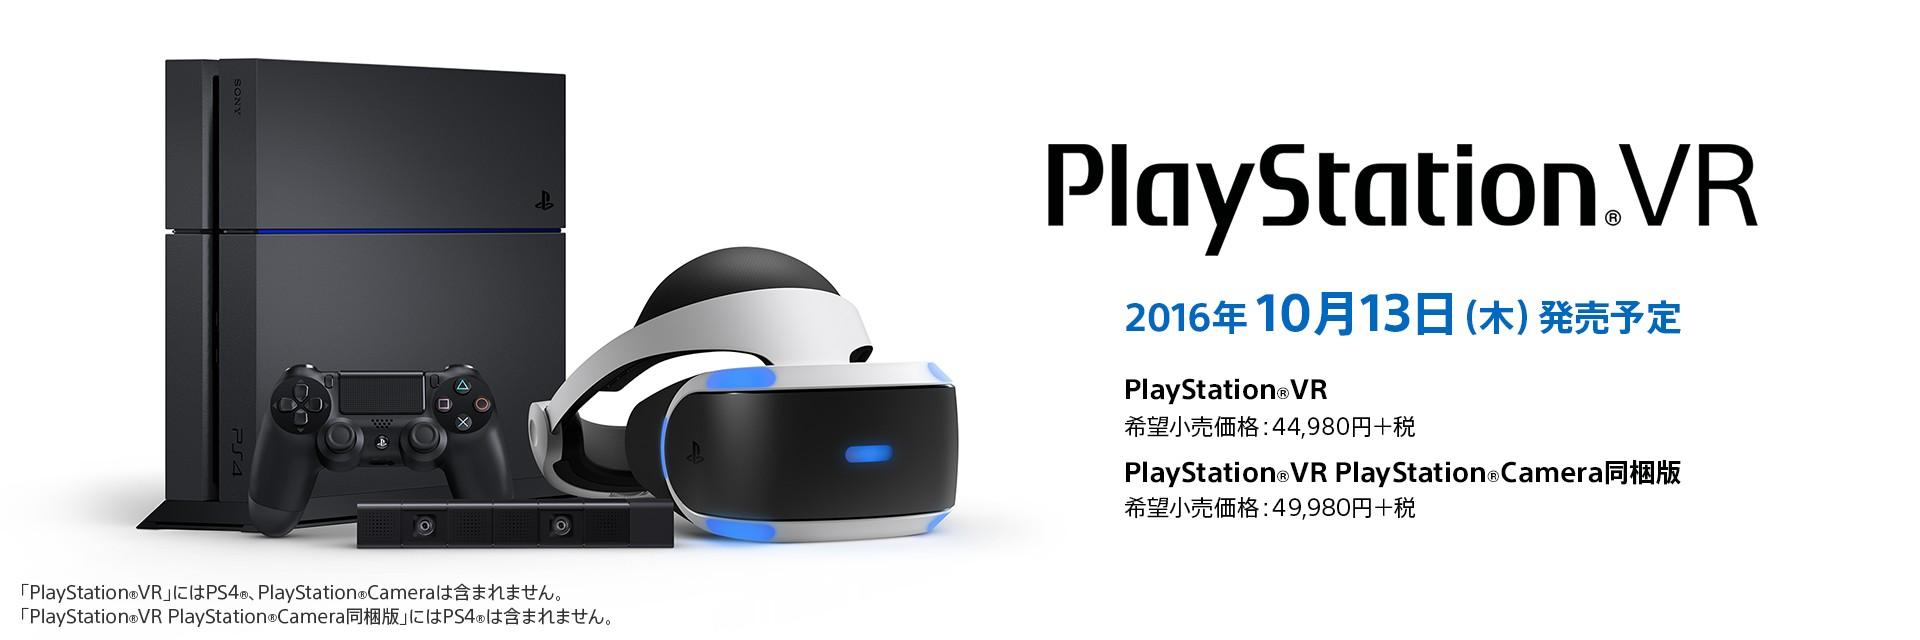 PlayStation VR、現時点のローンチタイトルは14